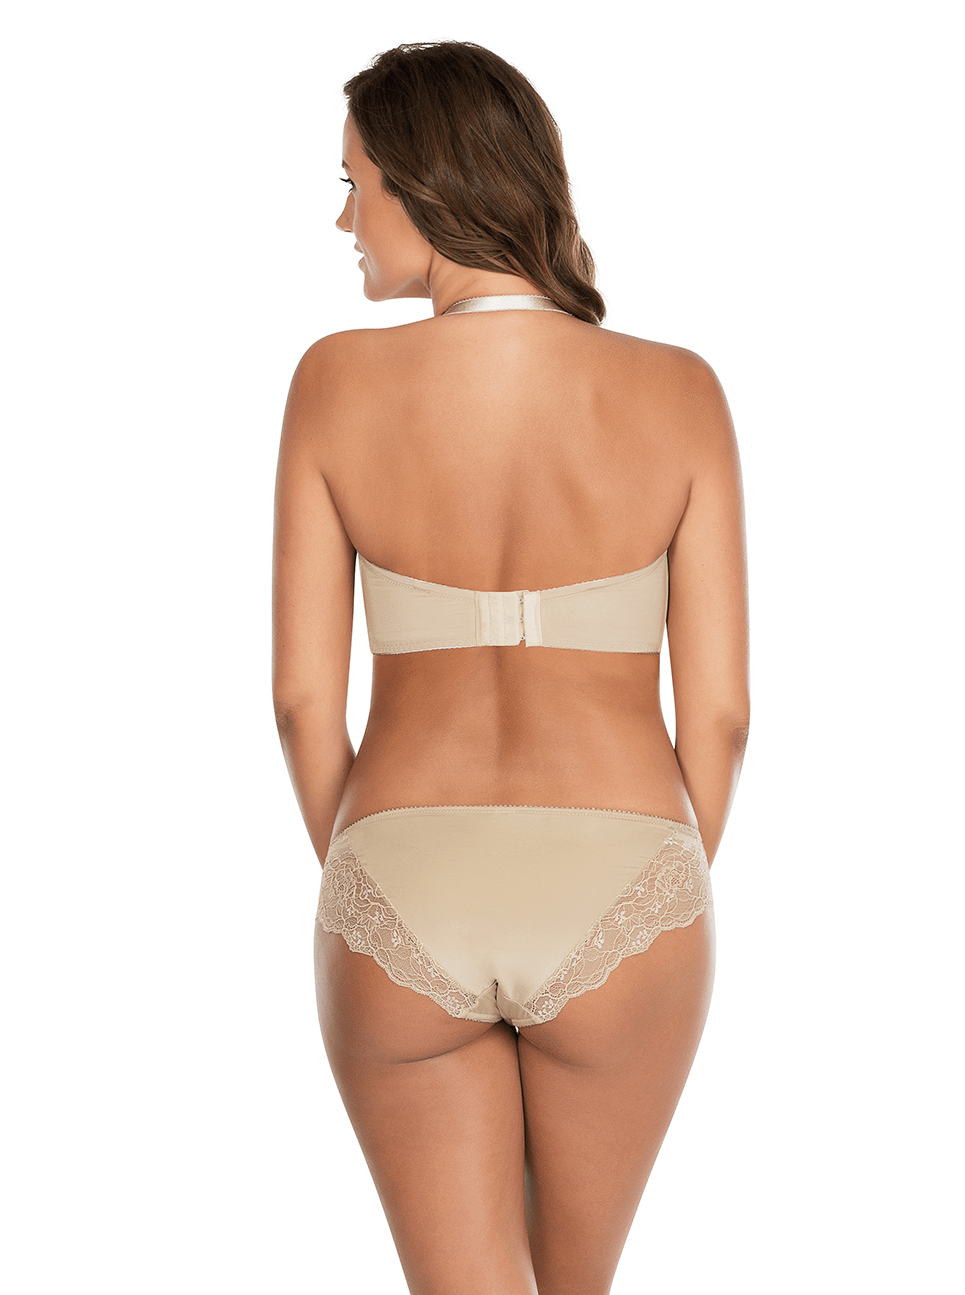 Elissa ContourUnderwireBraP5011 BikiniP5013 ENude Halter Back - Elissa Strappless Bra - European Nude - P5011